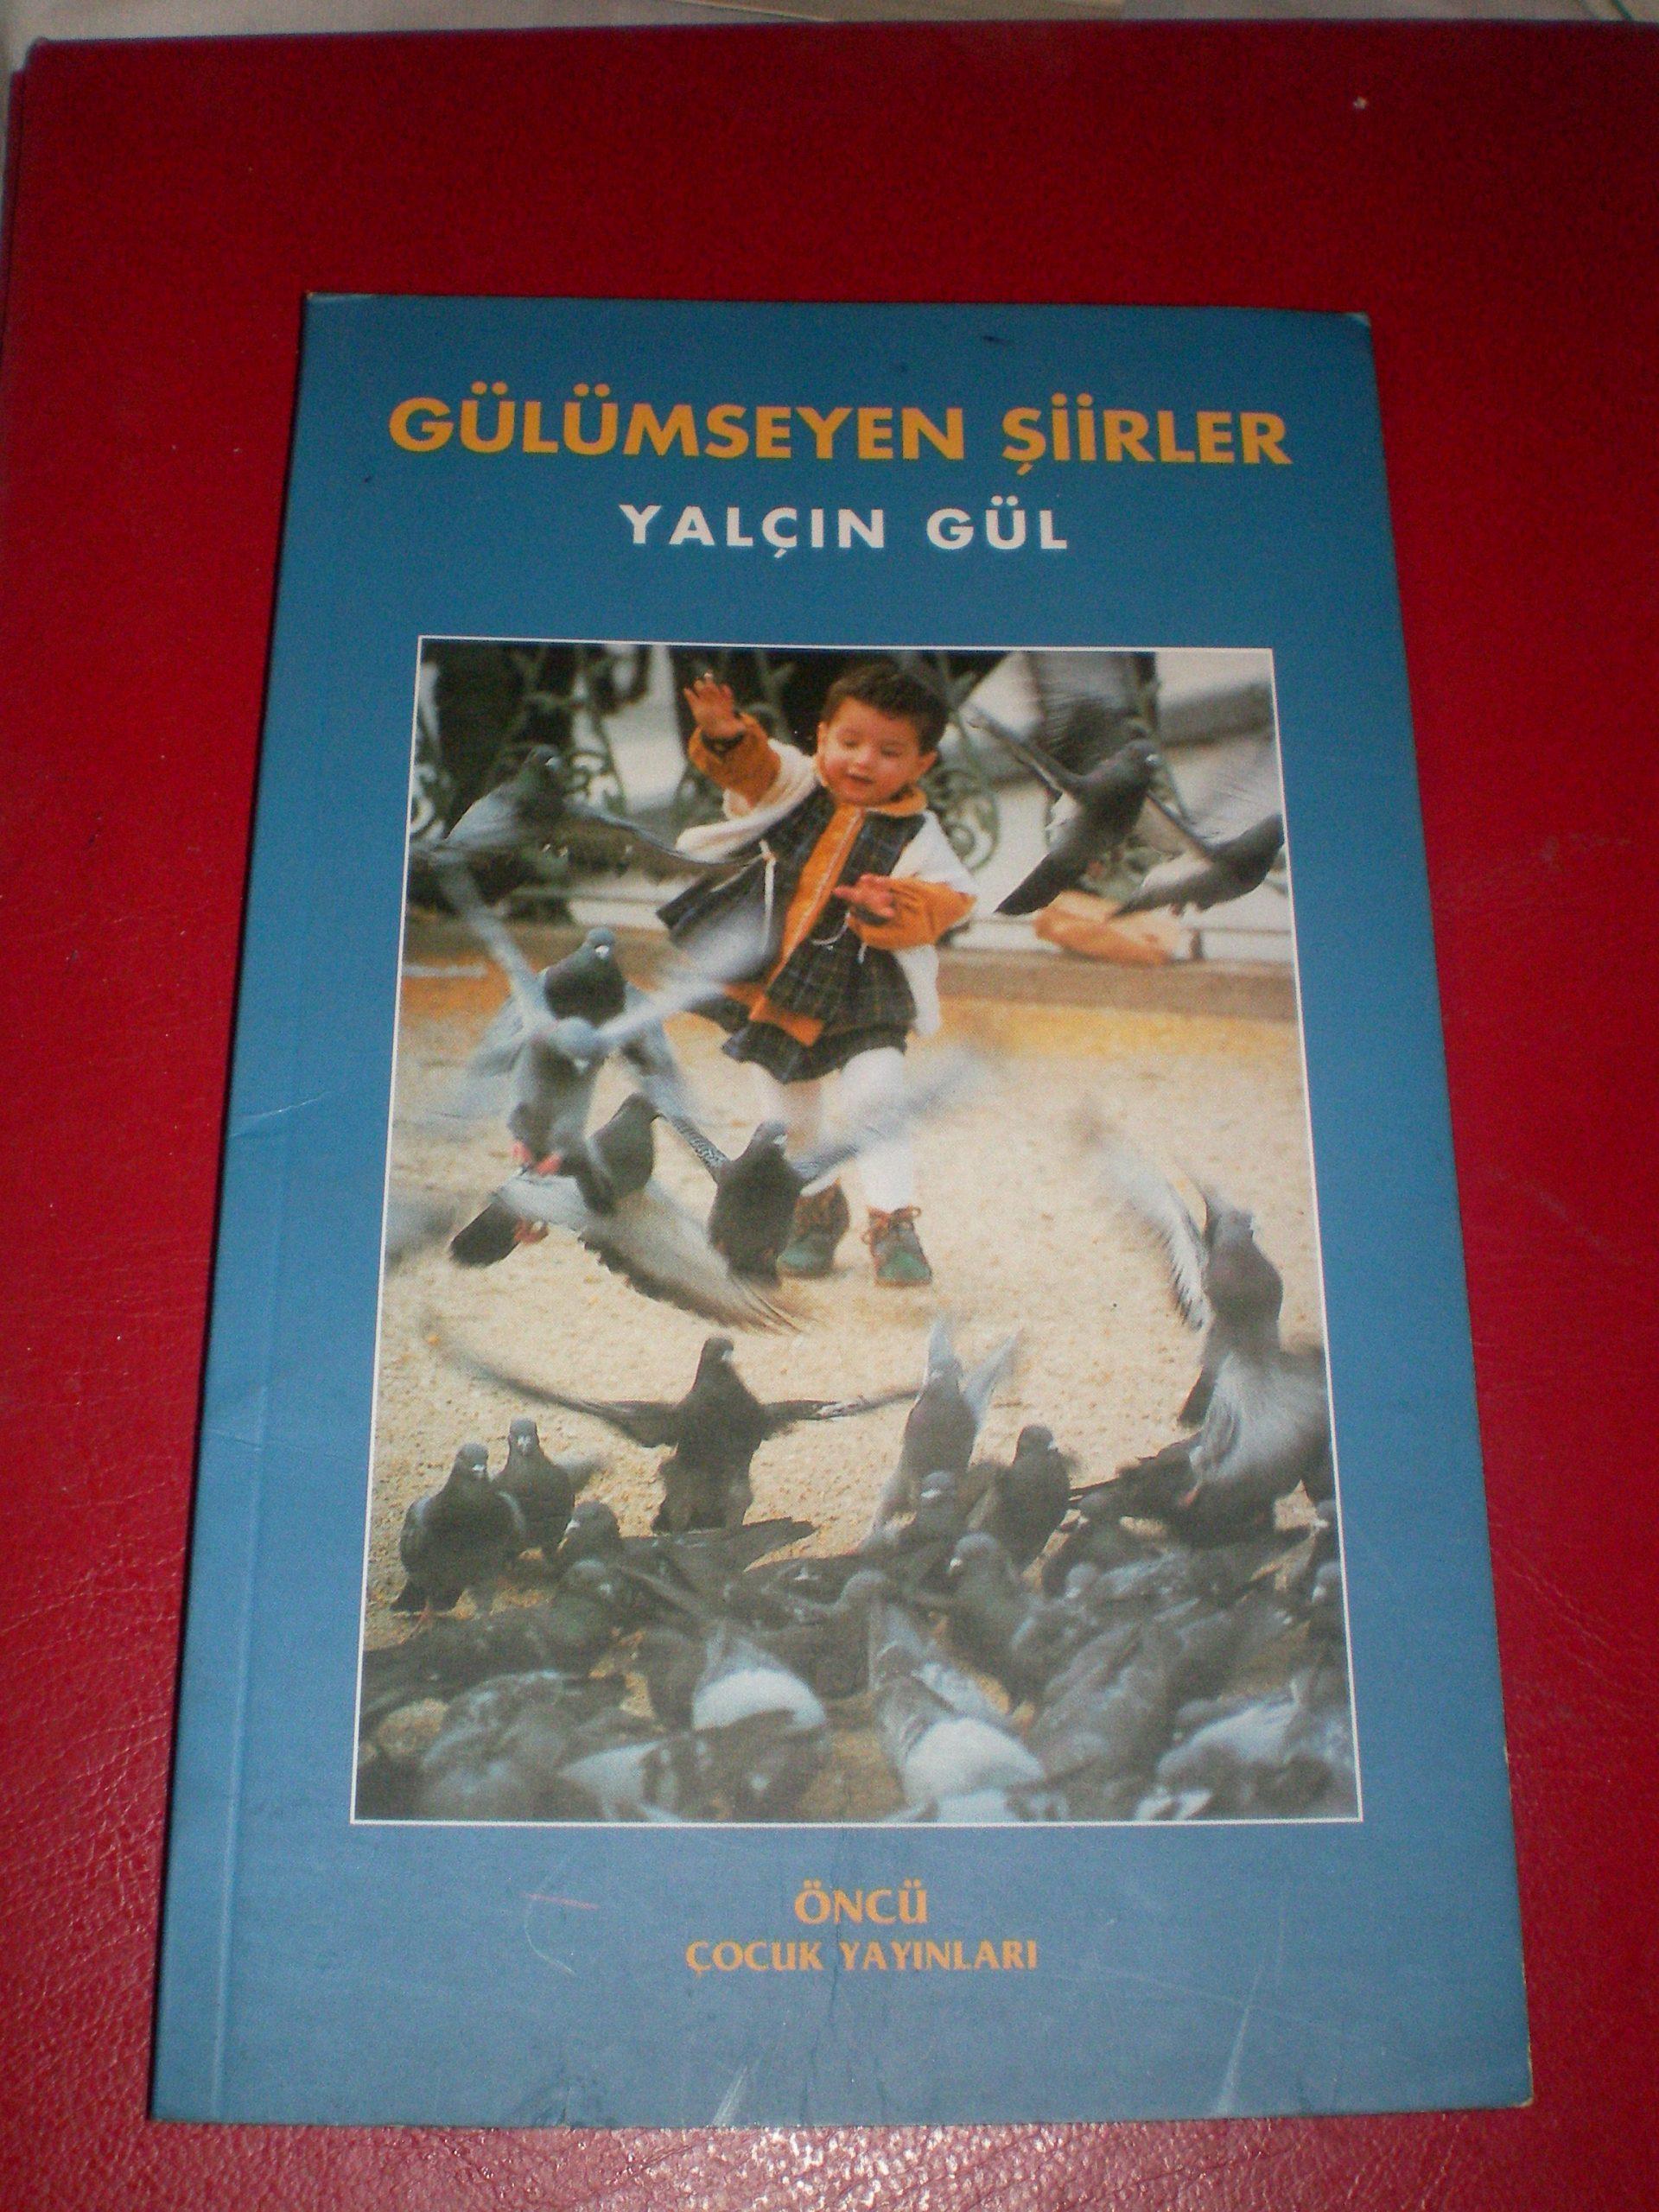 Gülümseyen şiirler/Yalçın GÜL/ 10 TL